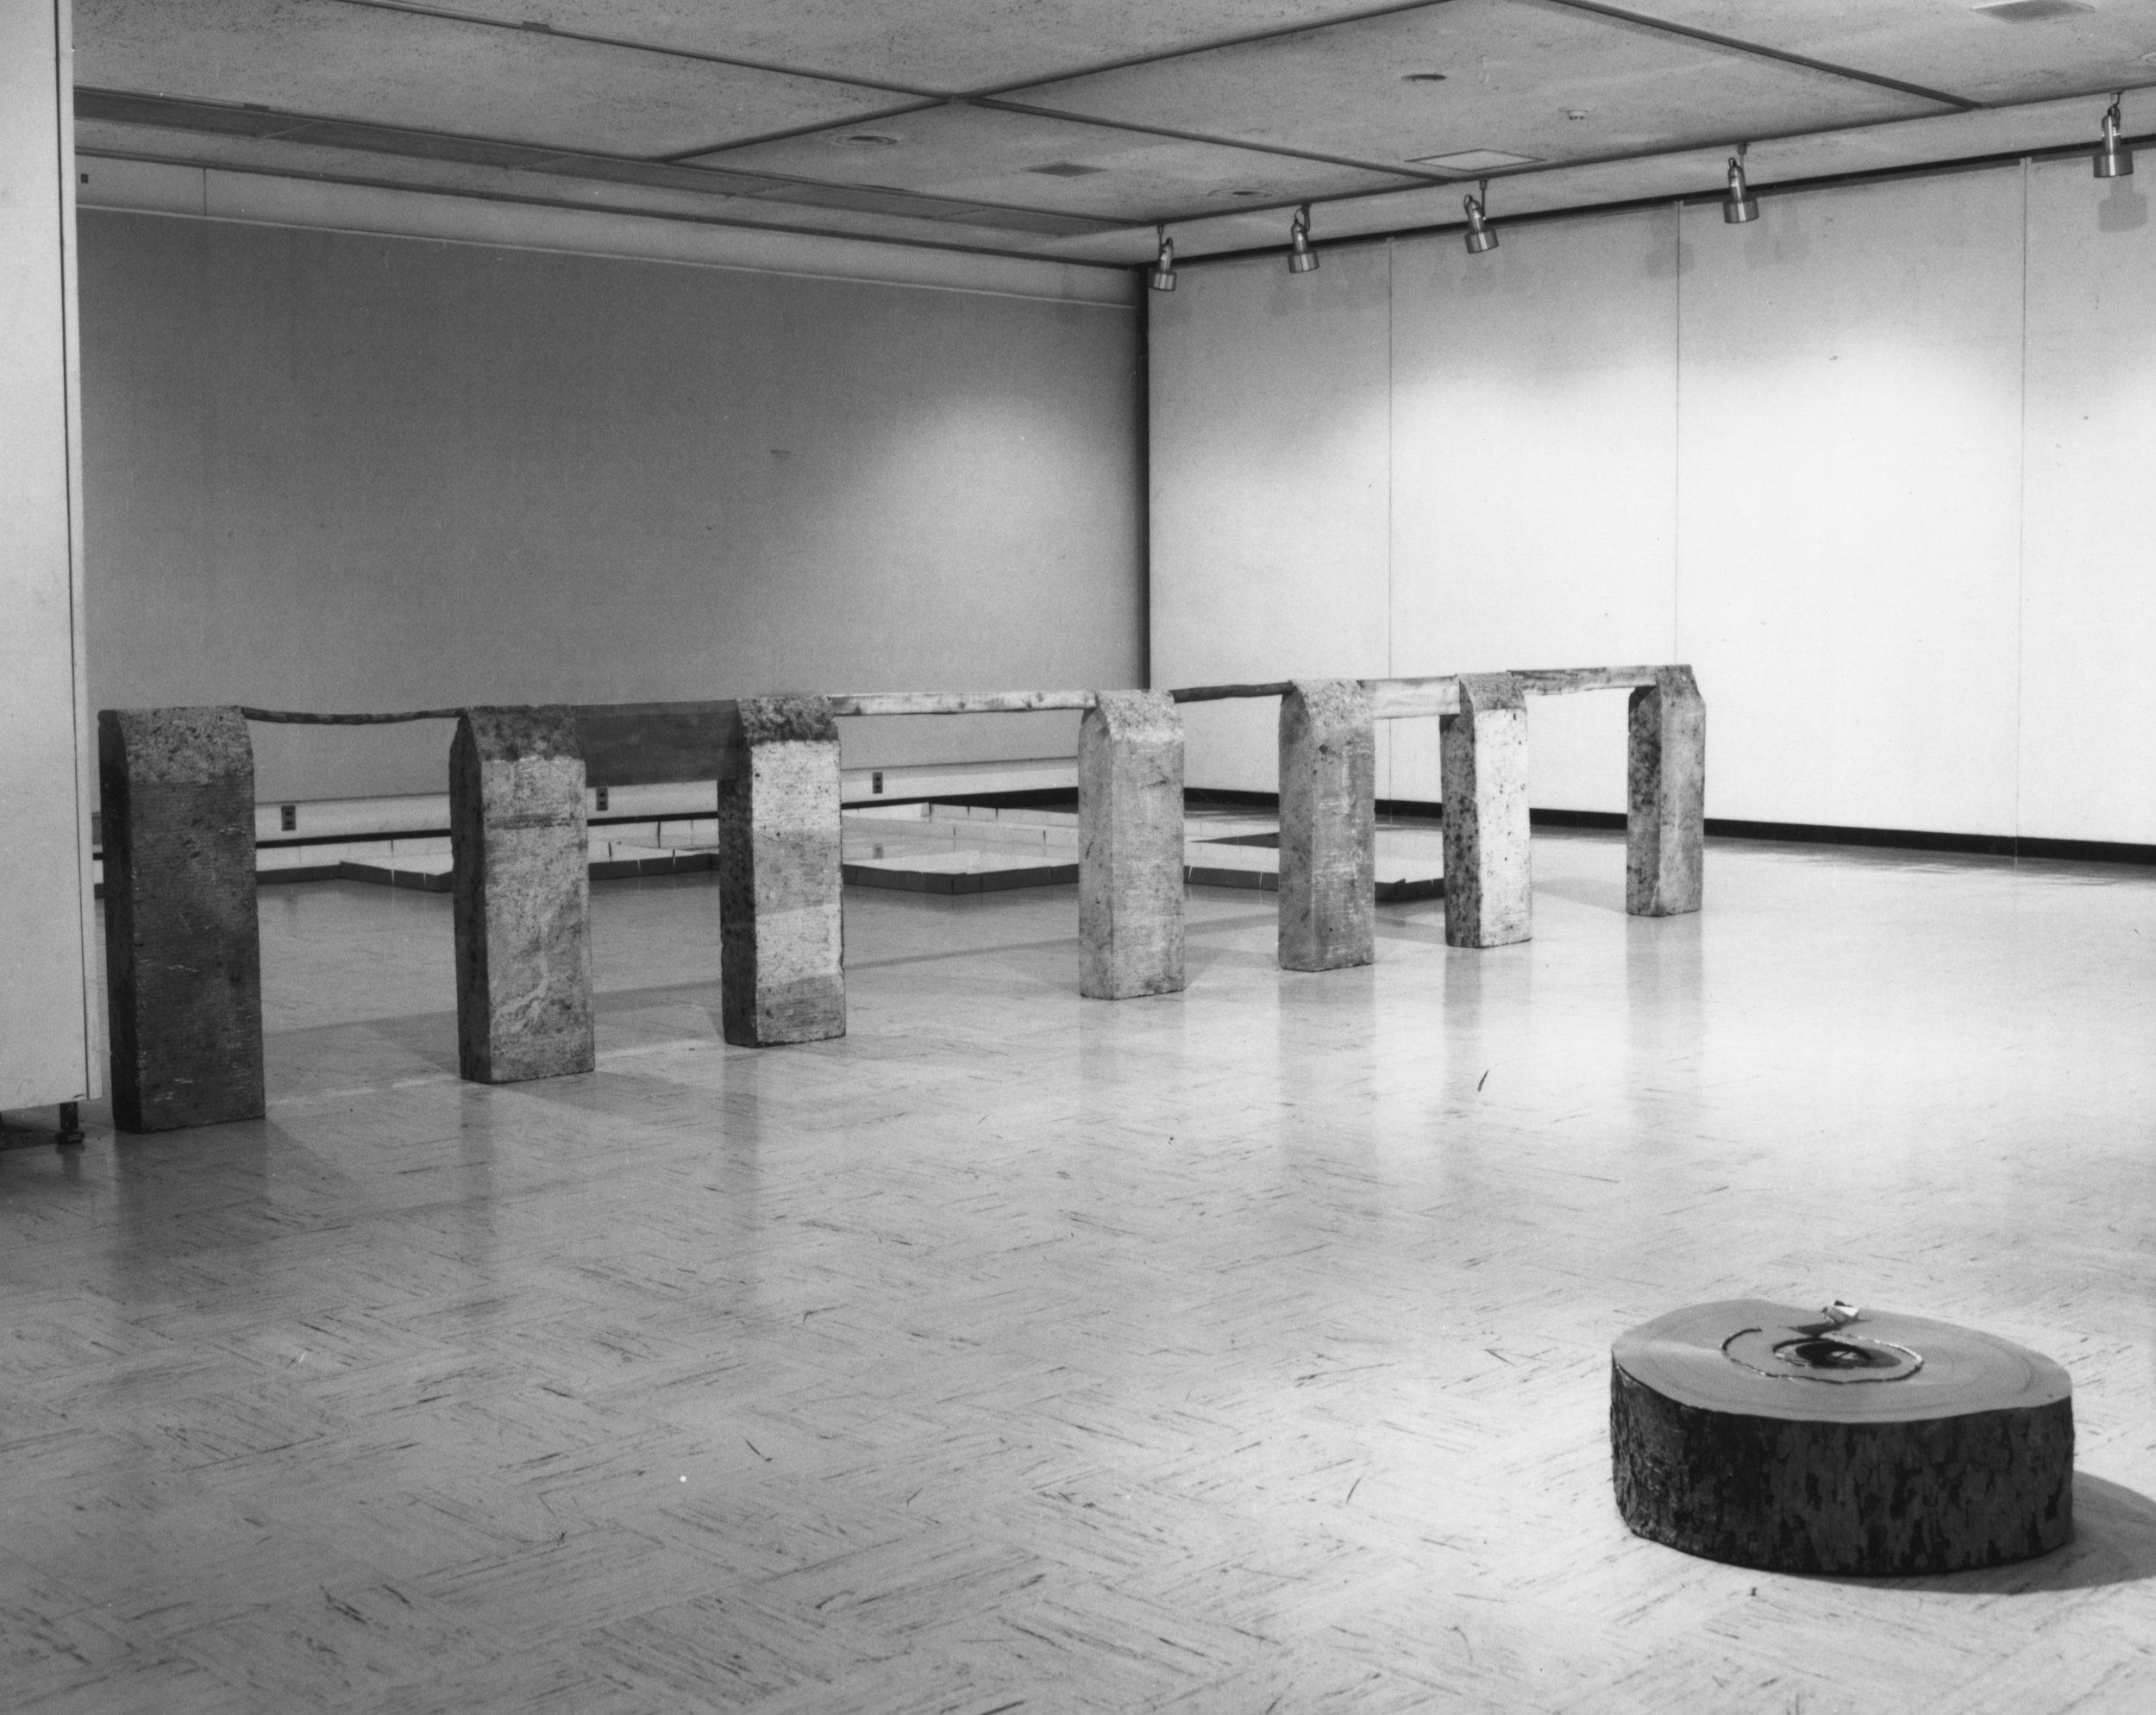 Perimeter ,1985 縁帯 ( Entai ) Oya stone, wood 930 x 90 x 15 centimeters Installation view,  The 21st Artists Today '85: When Installations Become Form ,Yokohama Civic Art Gallery, 1985 Photo: Kishio Suga